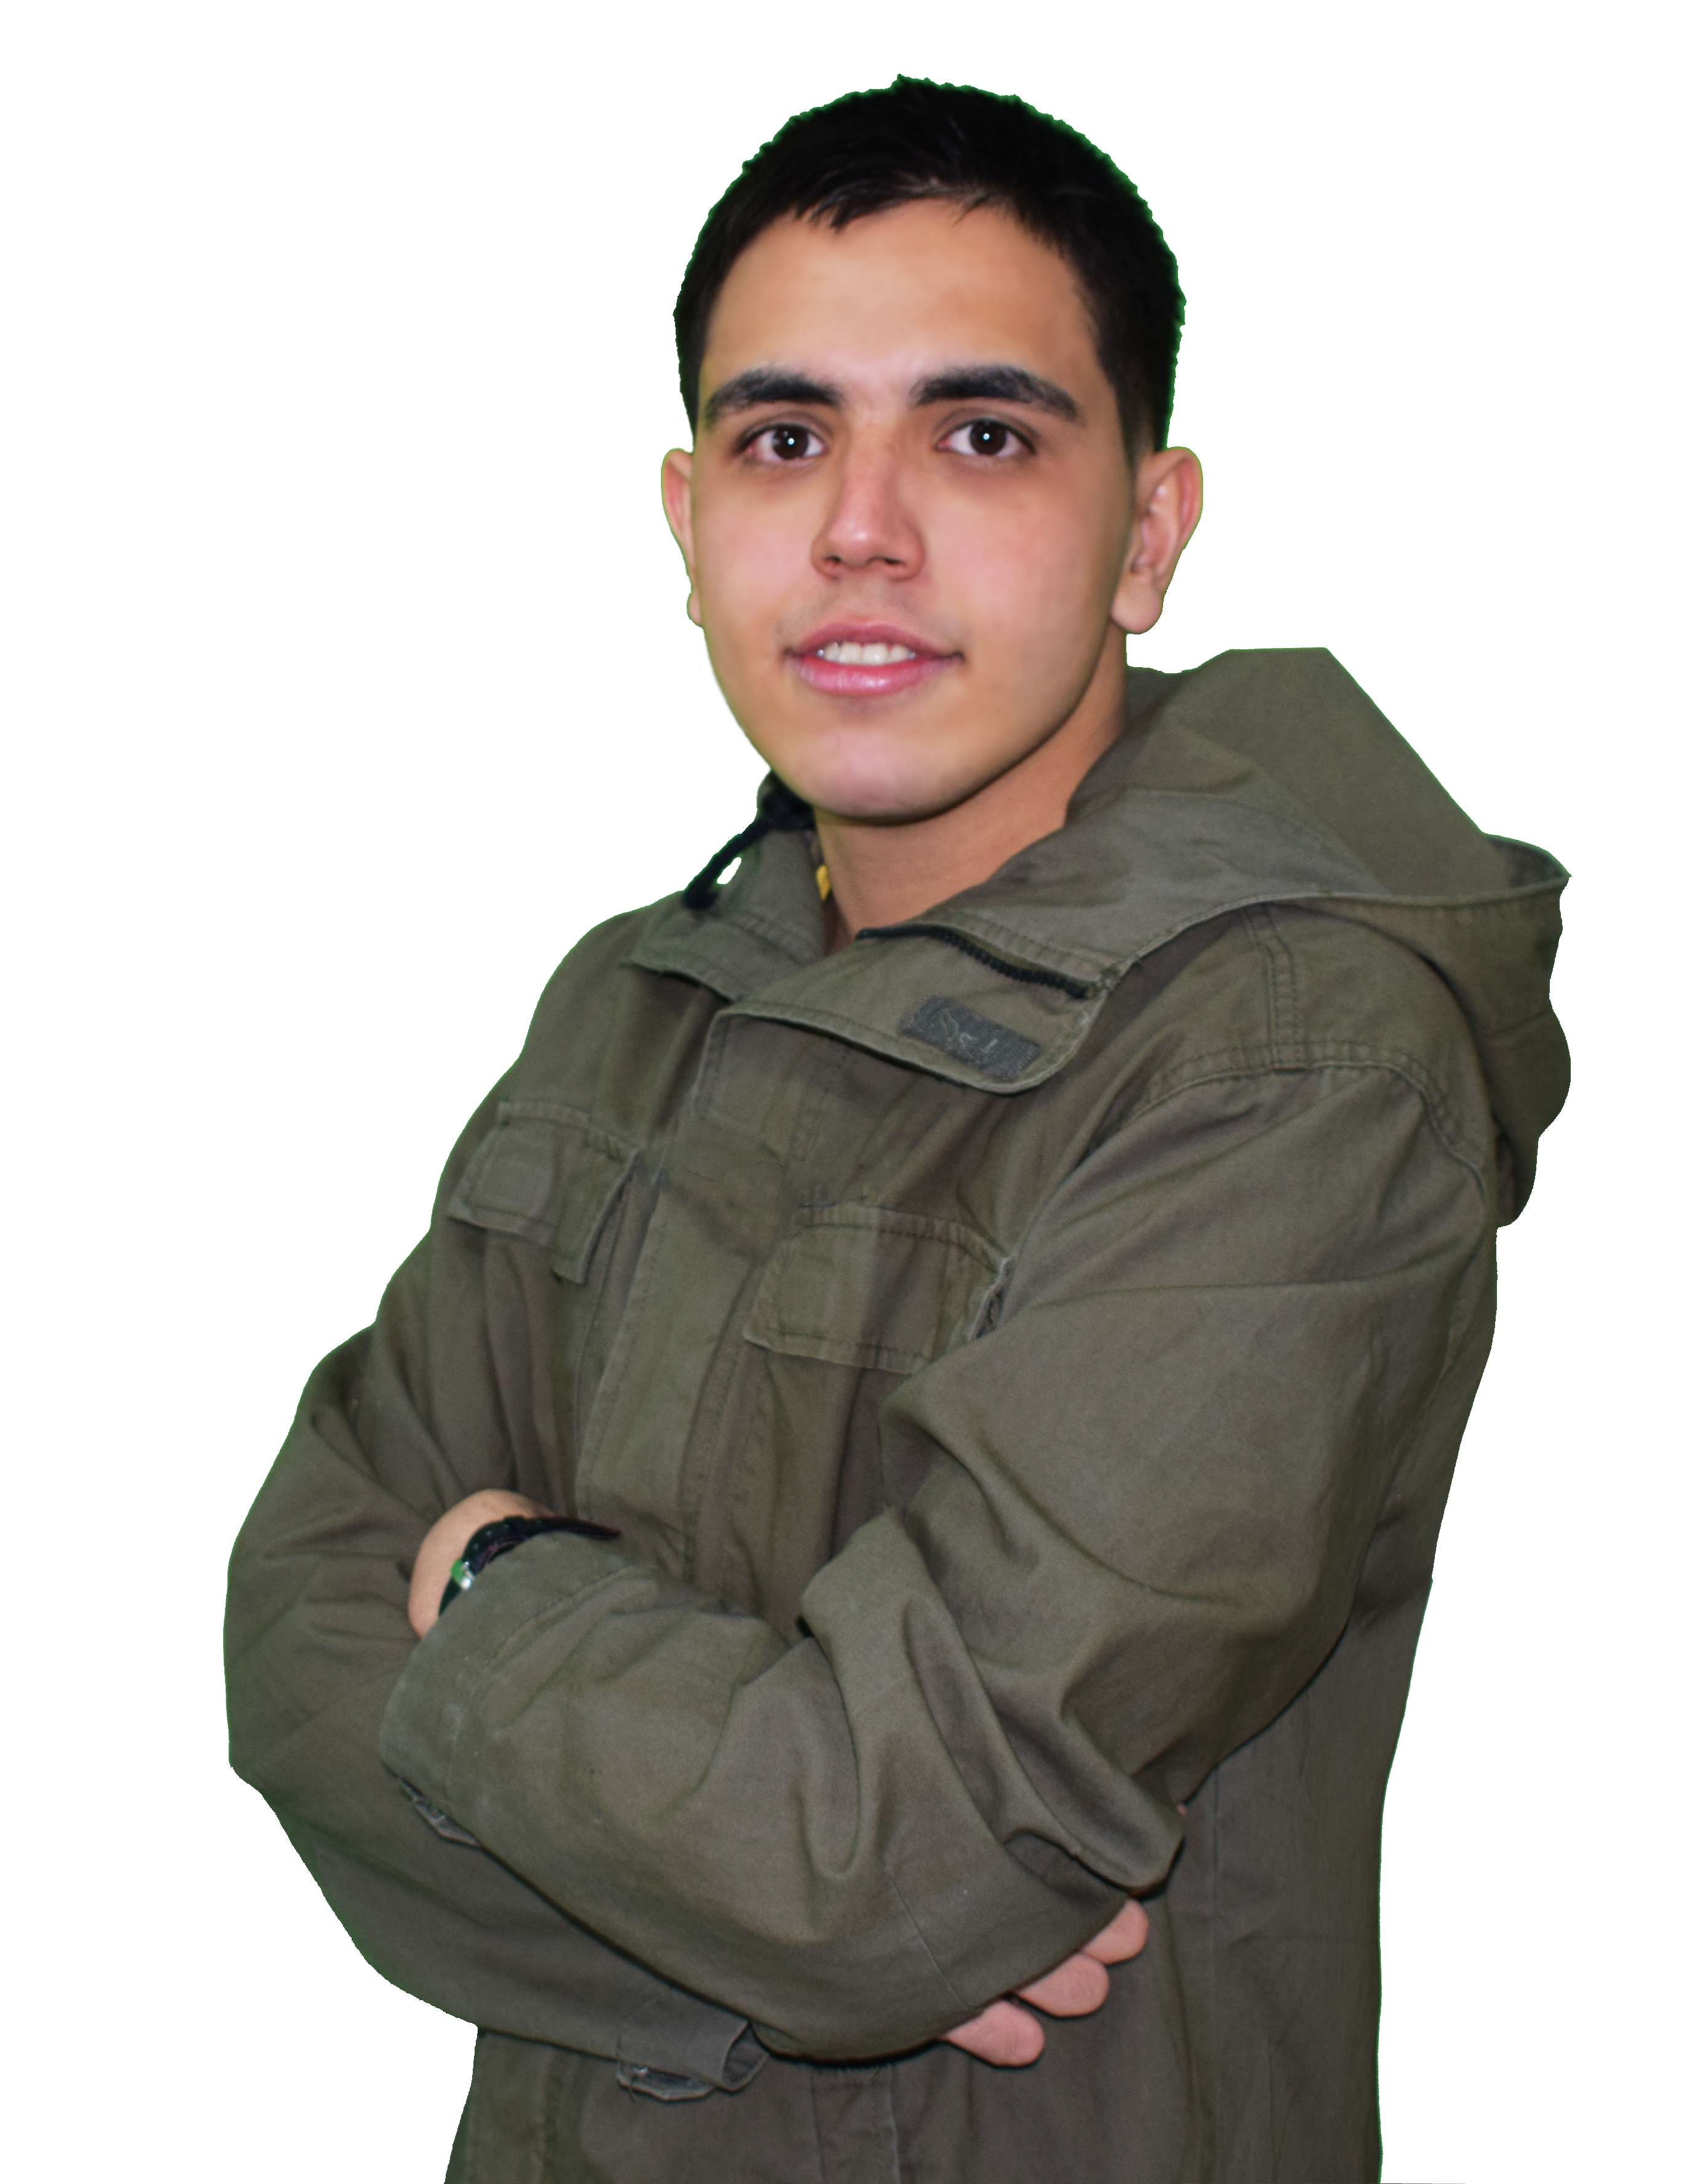 علی ایزدی - کارشناس دیجیتال مارکتینگ